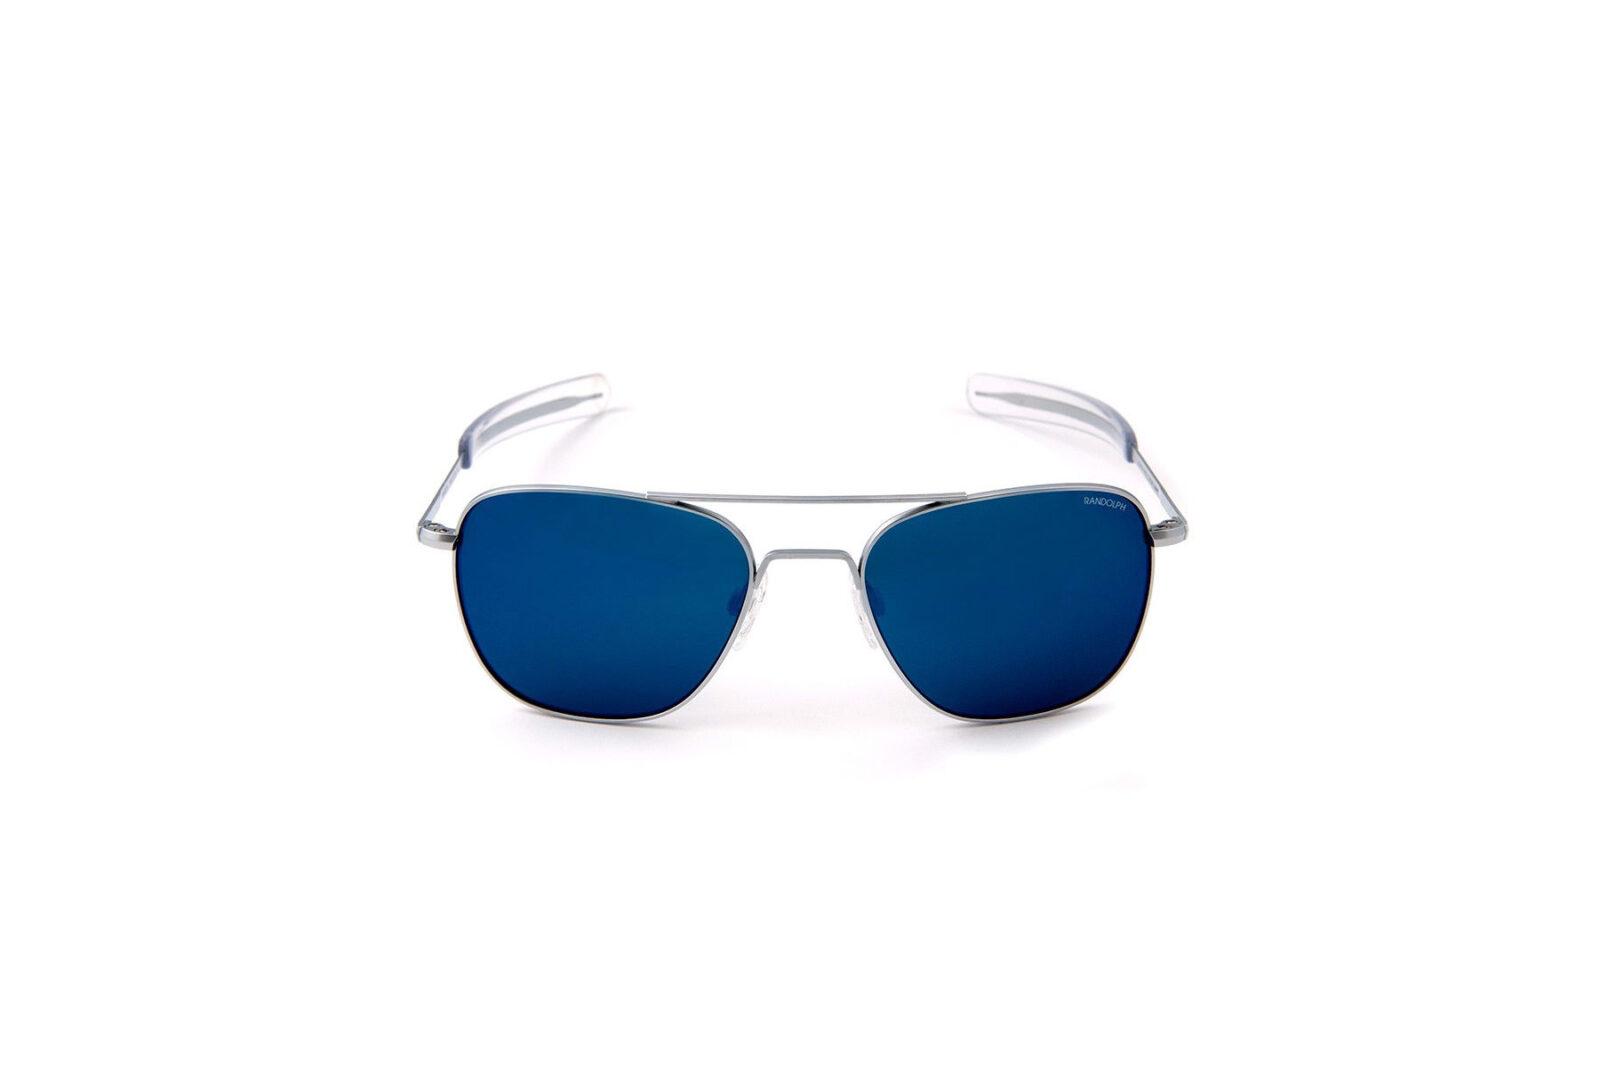 Randolph Aviator Sunglasses 1600x1081 - Randolph Engineering Aviator Sunglasses